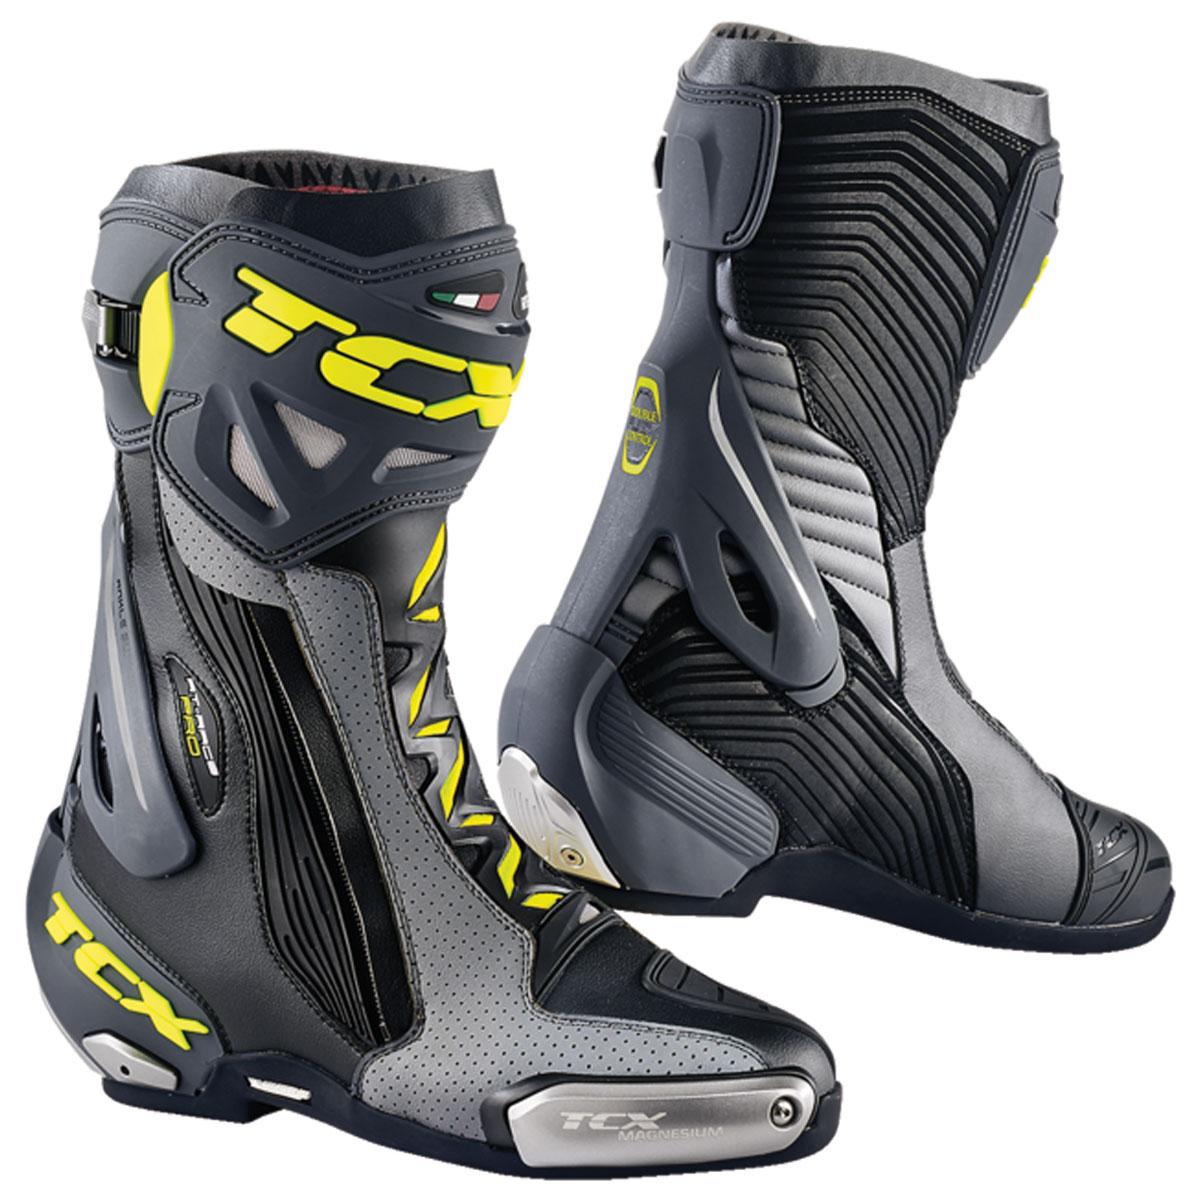 TCX Men's RT-Race Pro Air Black/Gray/Hi-Viz Boots